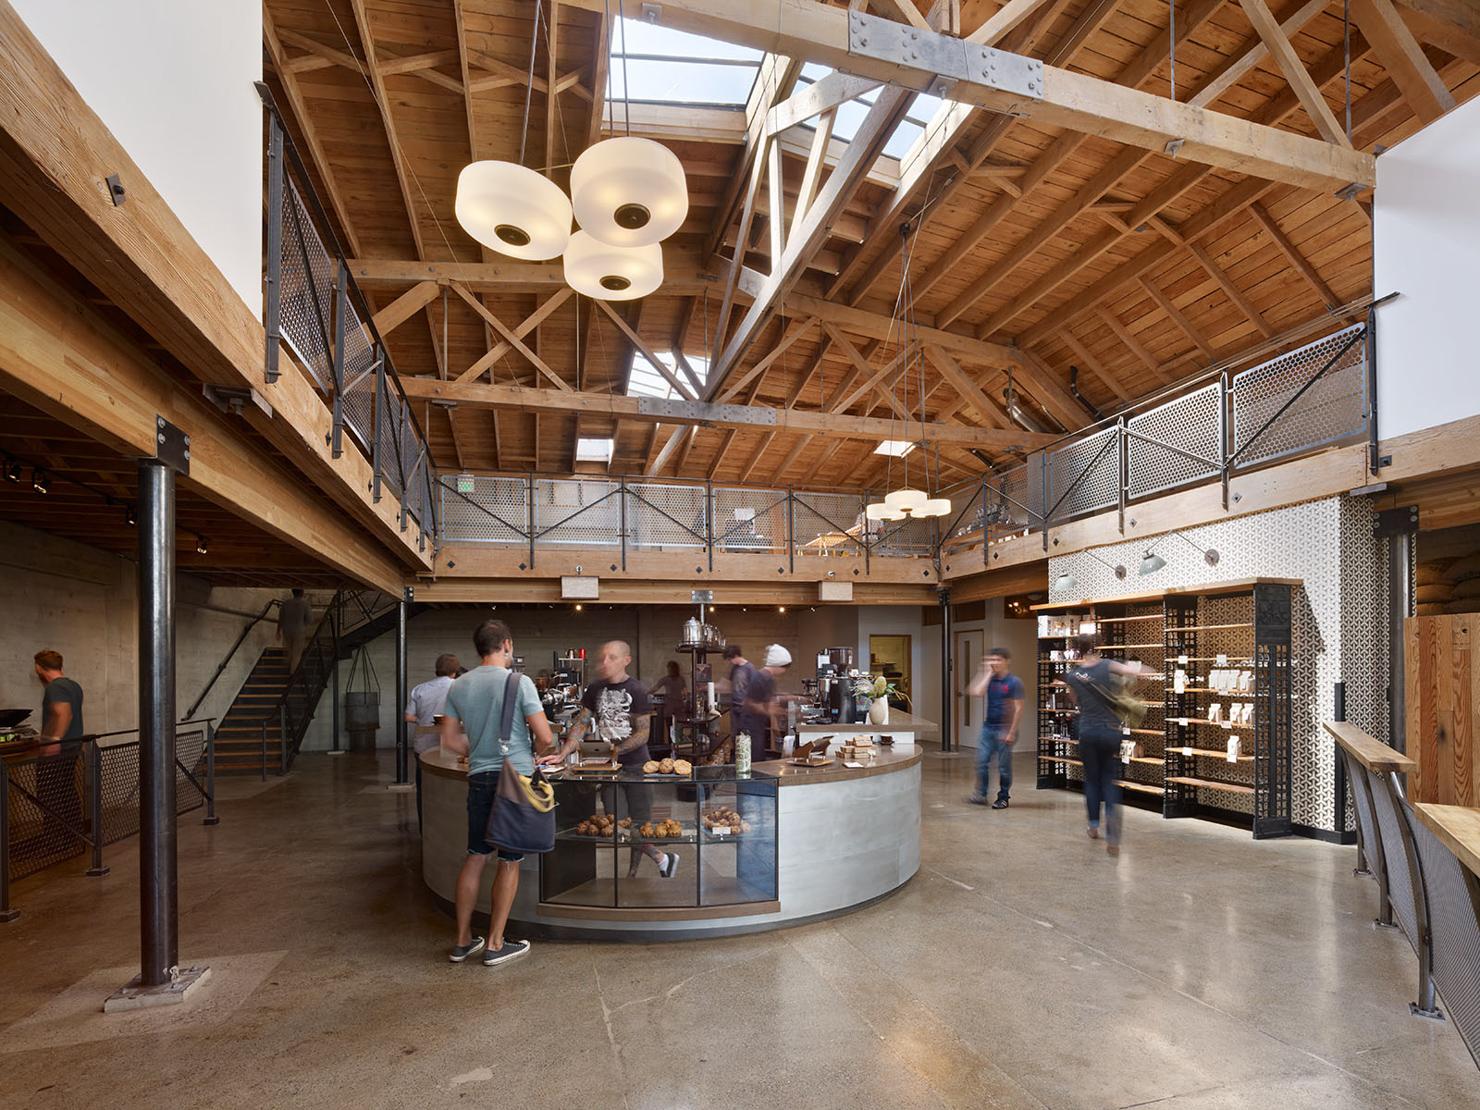 San Francisco - 1. Sightglass Coffee2. Verve Coffee Roasters3. Saint Frank CoffeeFull San Francisco list here.